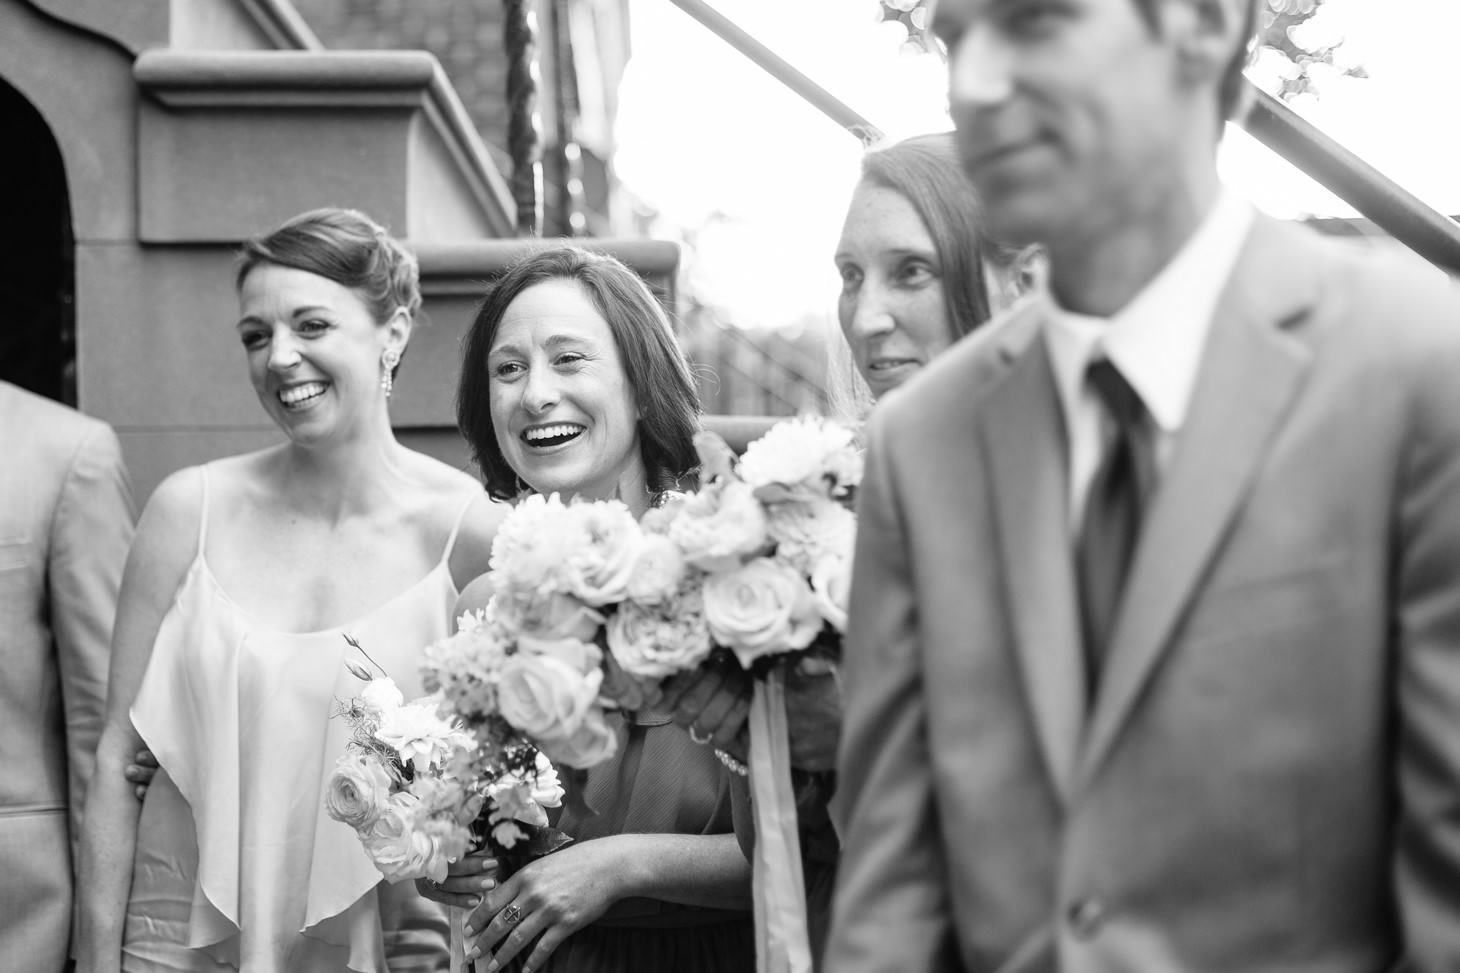 brooklyn-restaurant-wedding-nyc-weddingi-photographer-smitten-chickens19.jpg